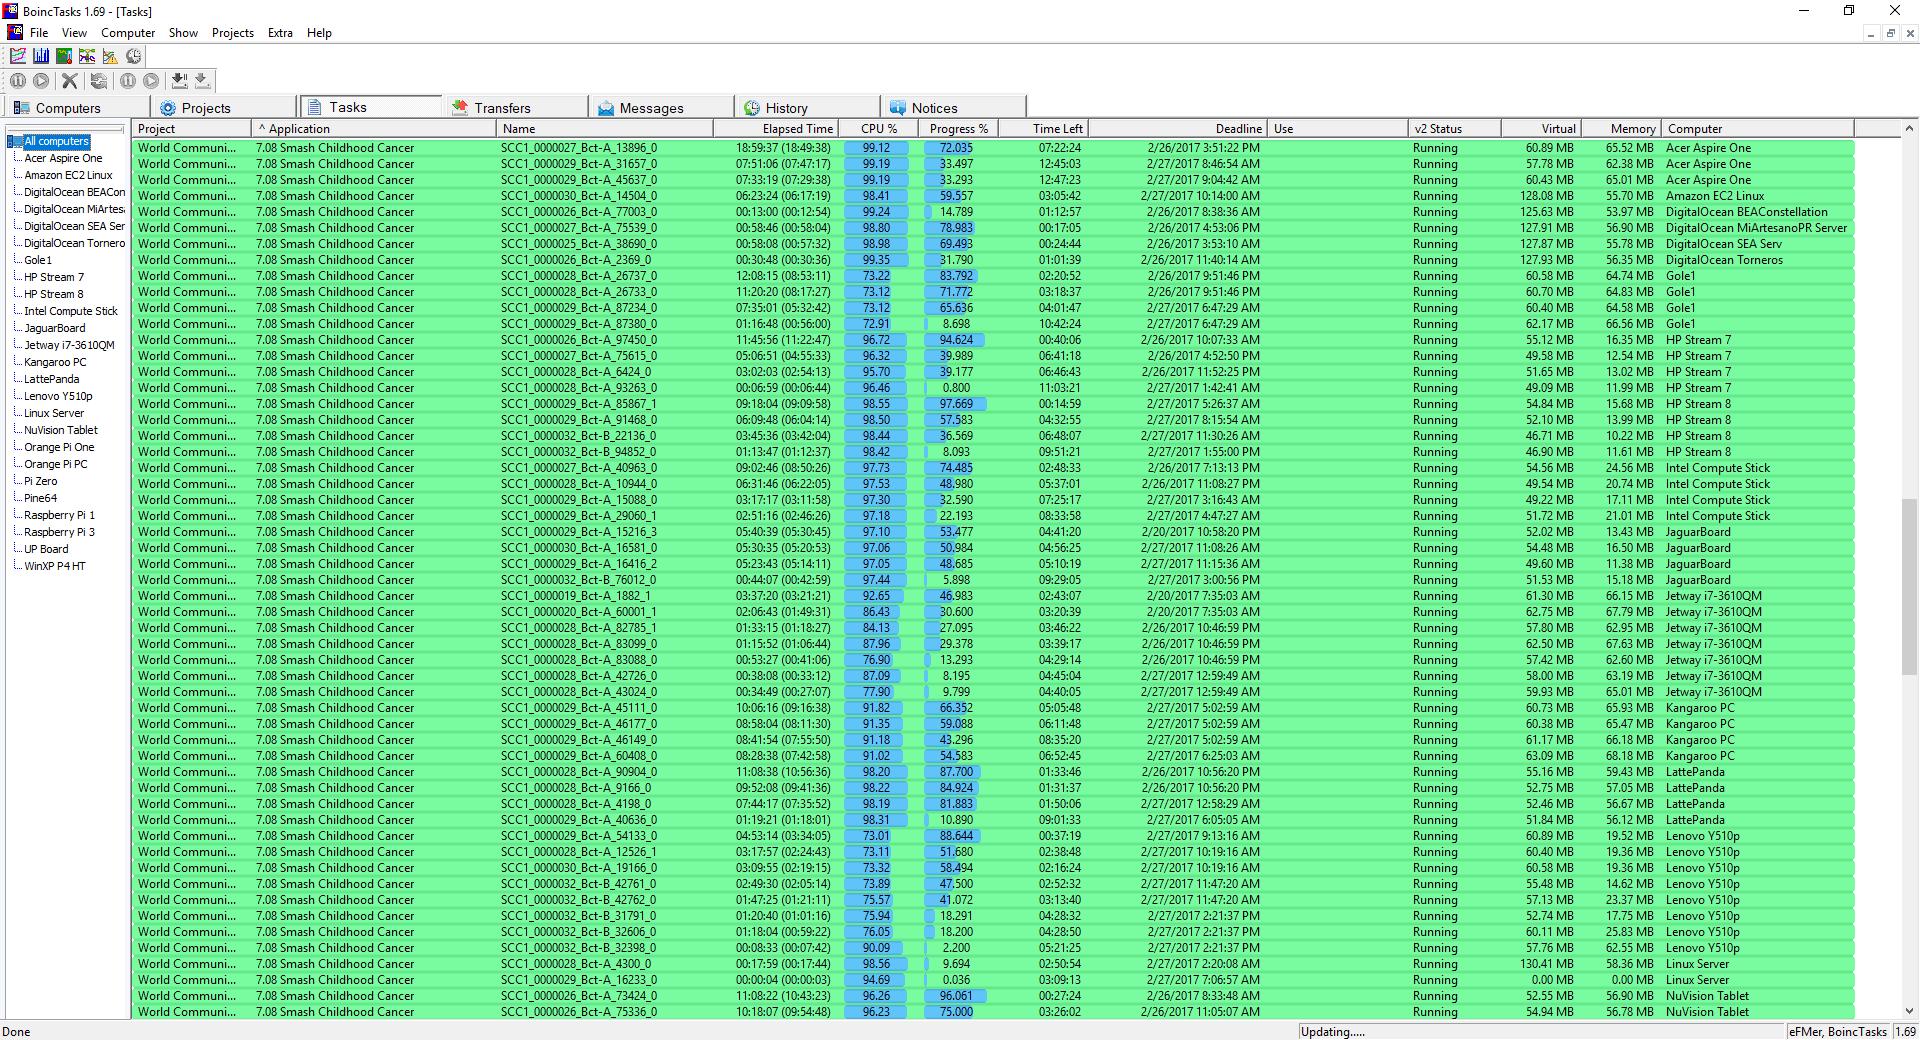 BOINC Tasks in BOINCTasks